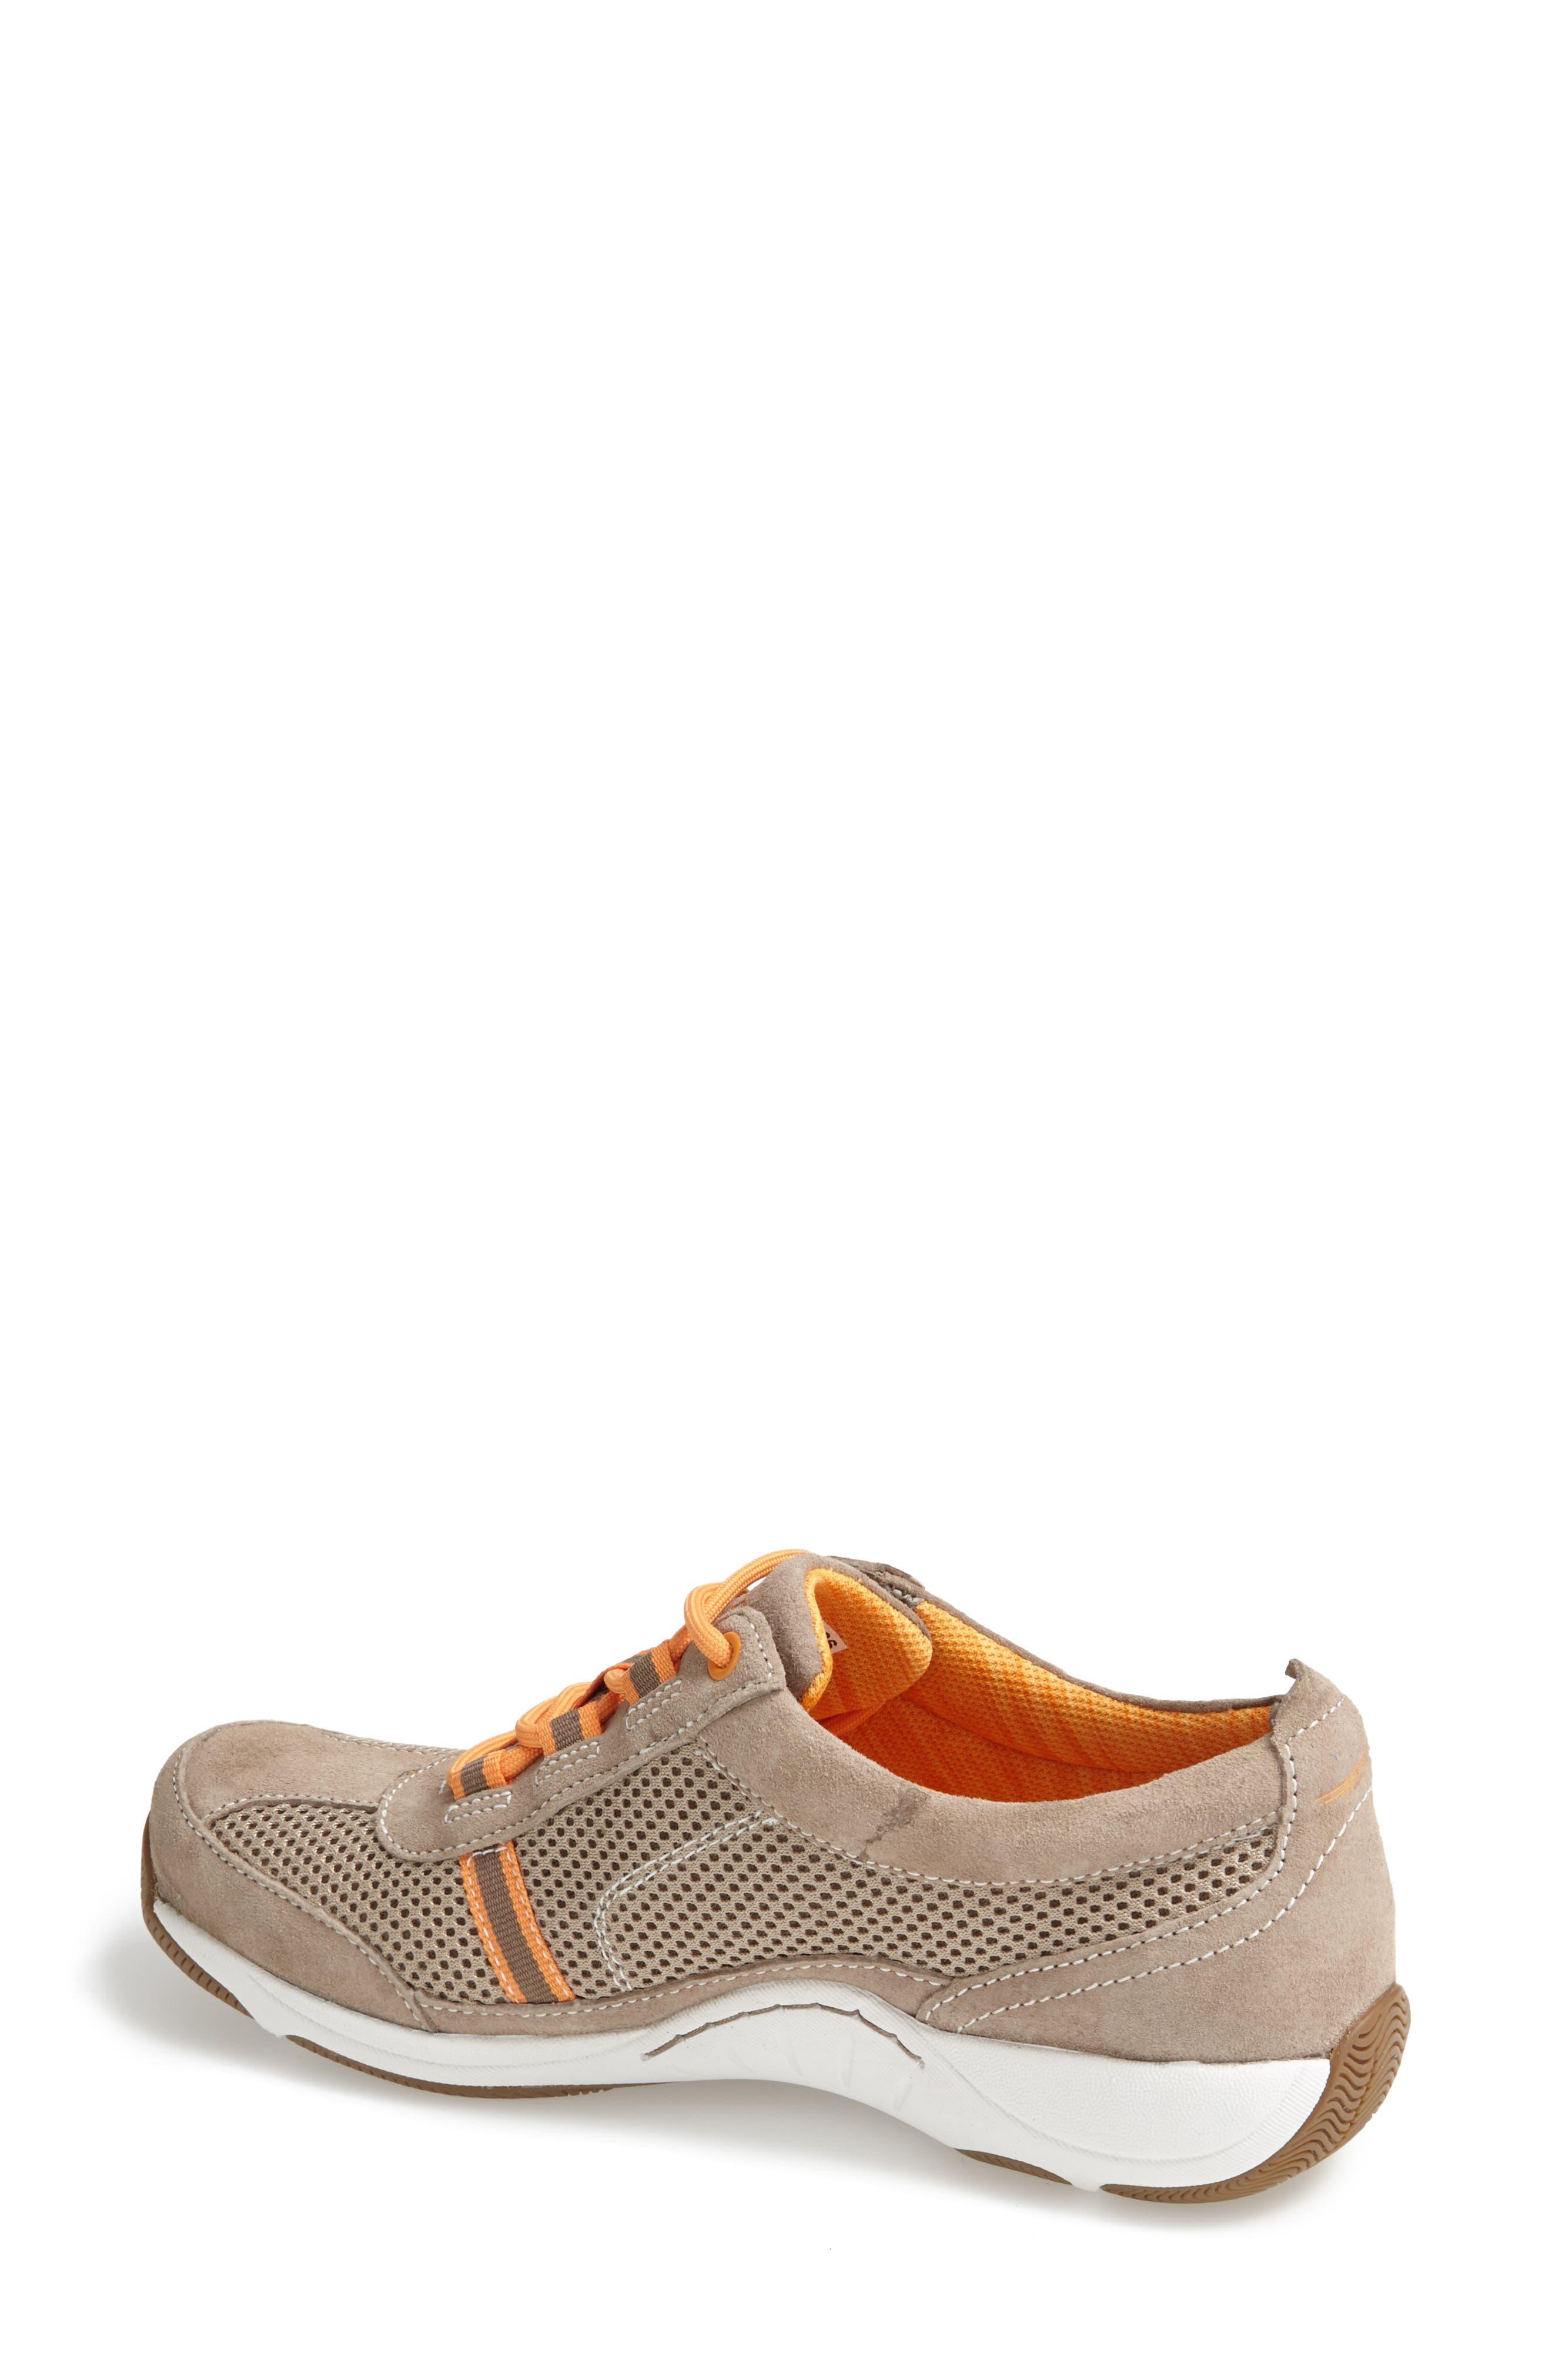 'Helen' Suede & Mesh Sneaker,                             Alternate thumbnail 69, color,